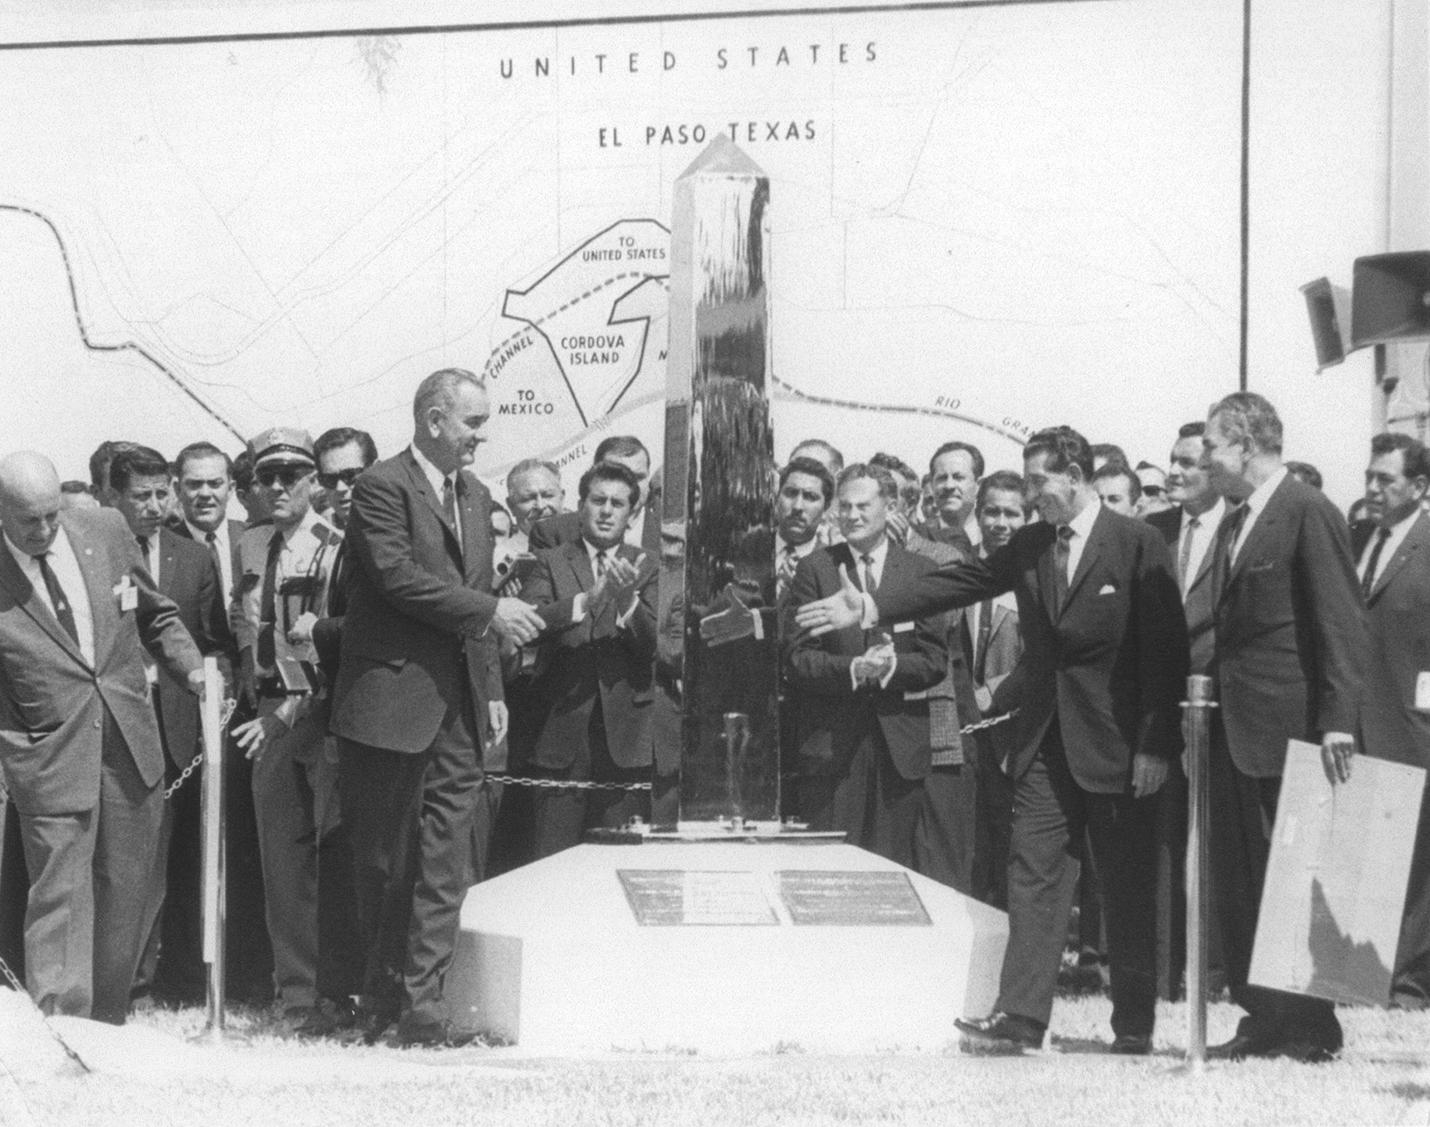 Johnson & Mateos Sept 25 1964 b&w